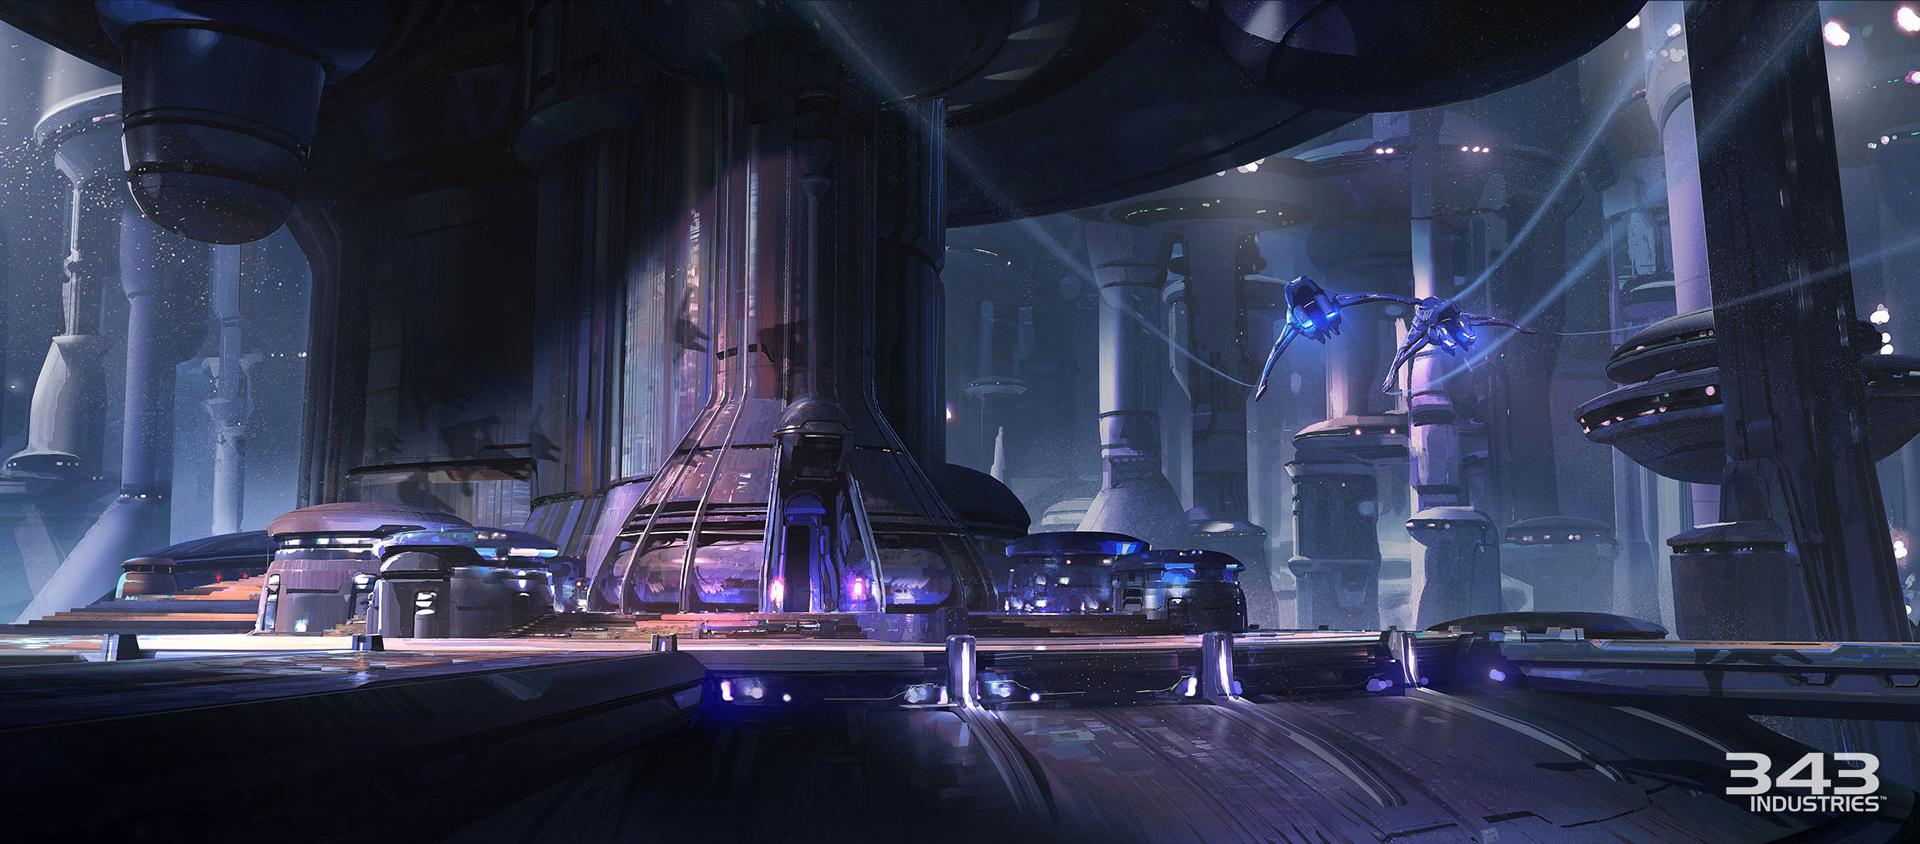 Killzone Shadow Fall Full Hd Wallpaper Halo 5 Guardians Concept Art By Darren Bacon Concept